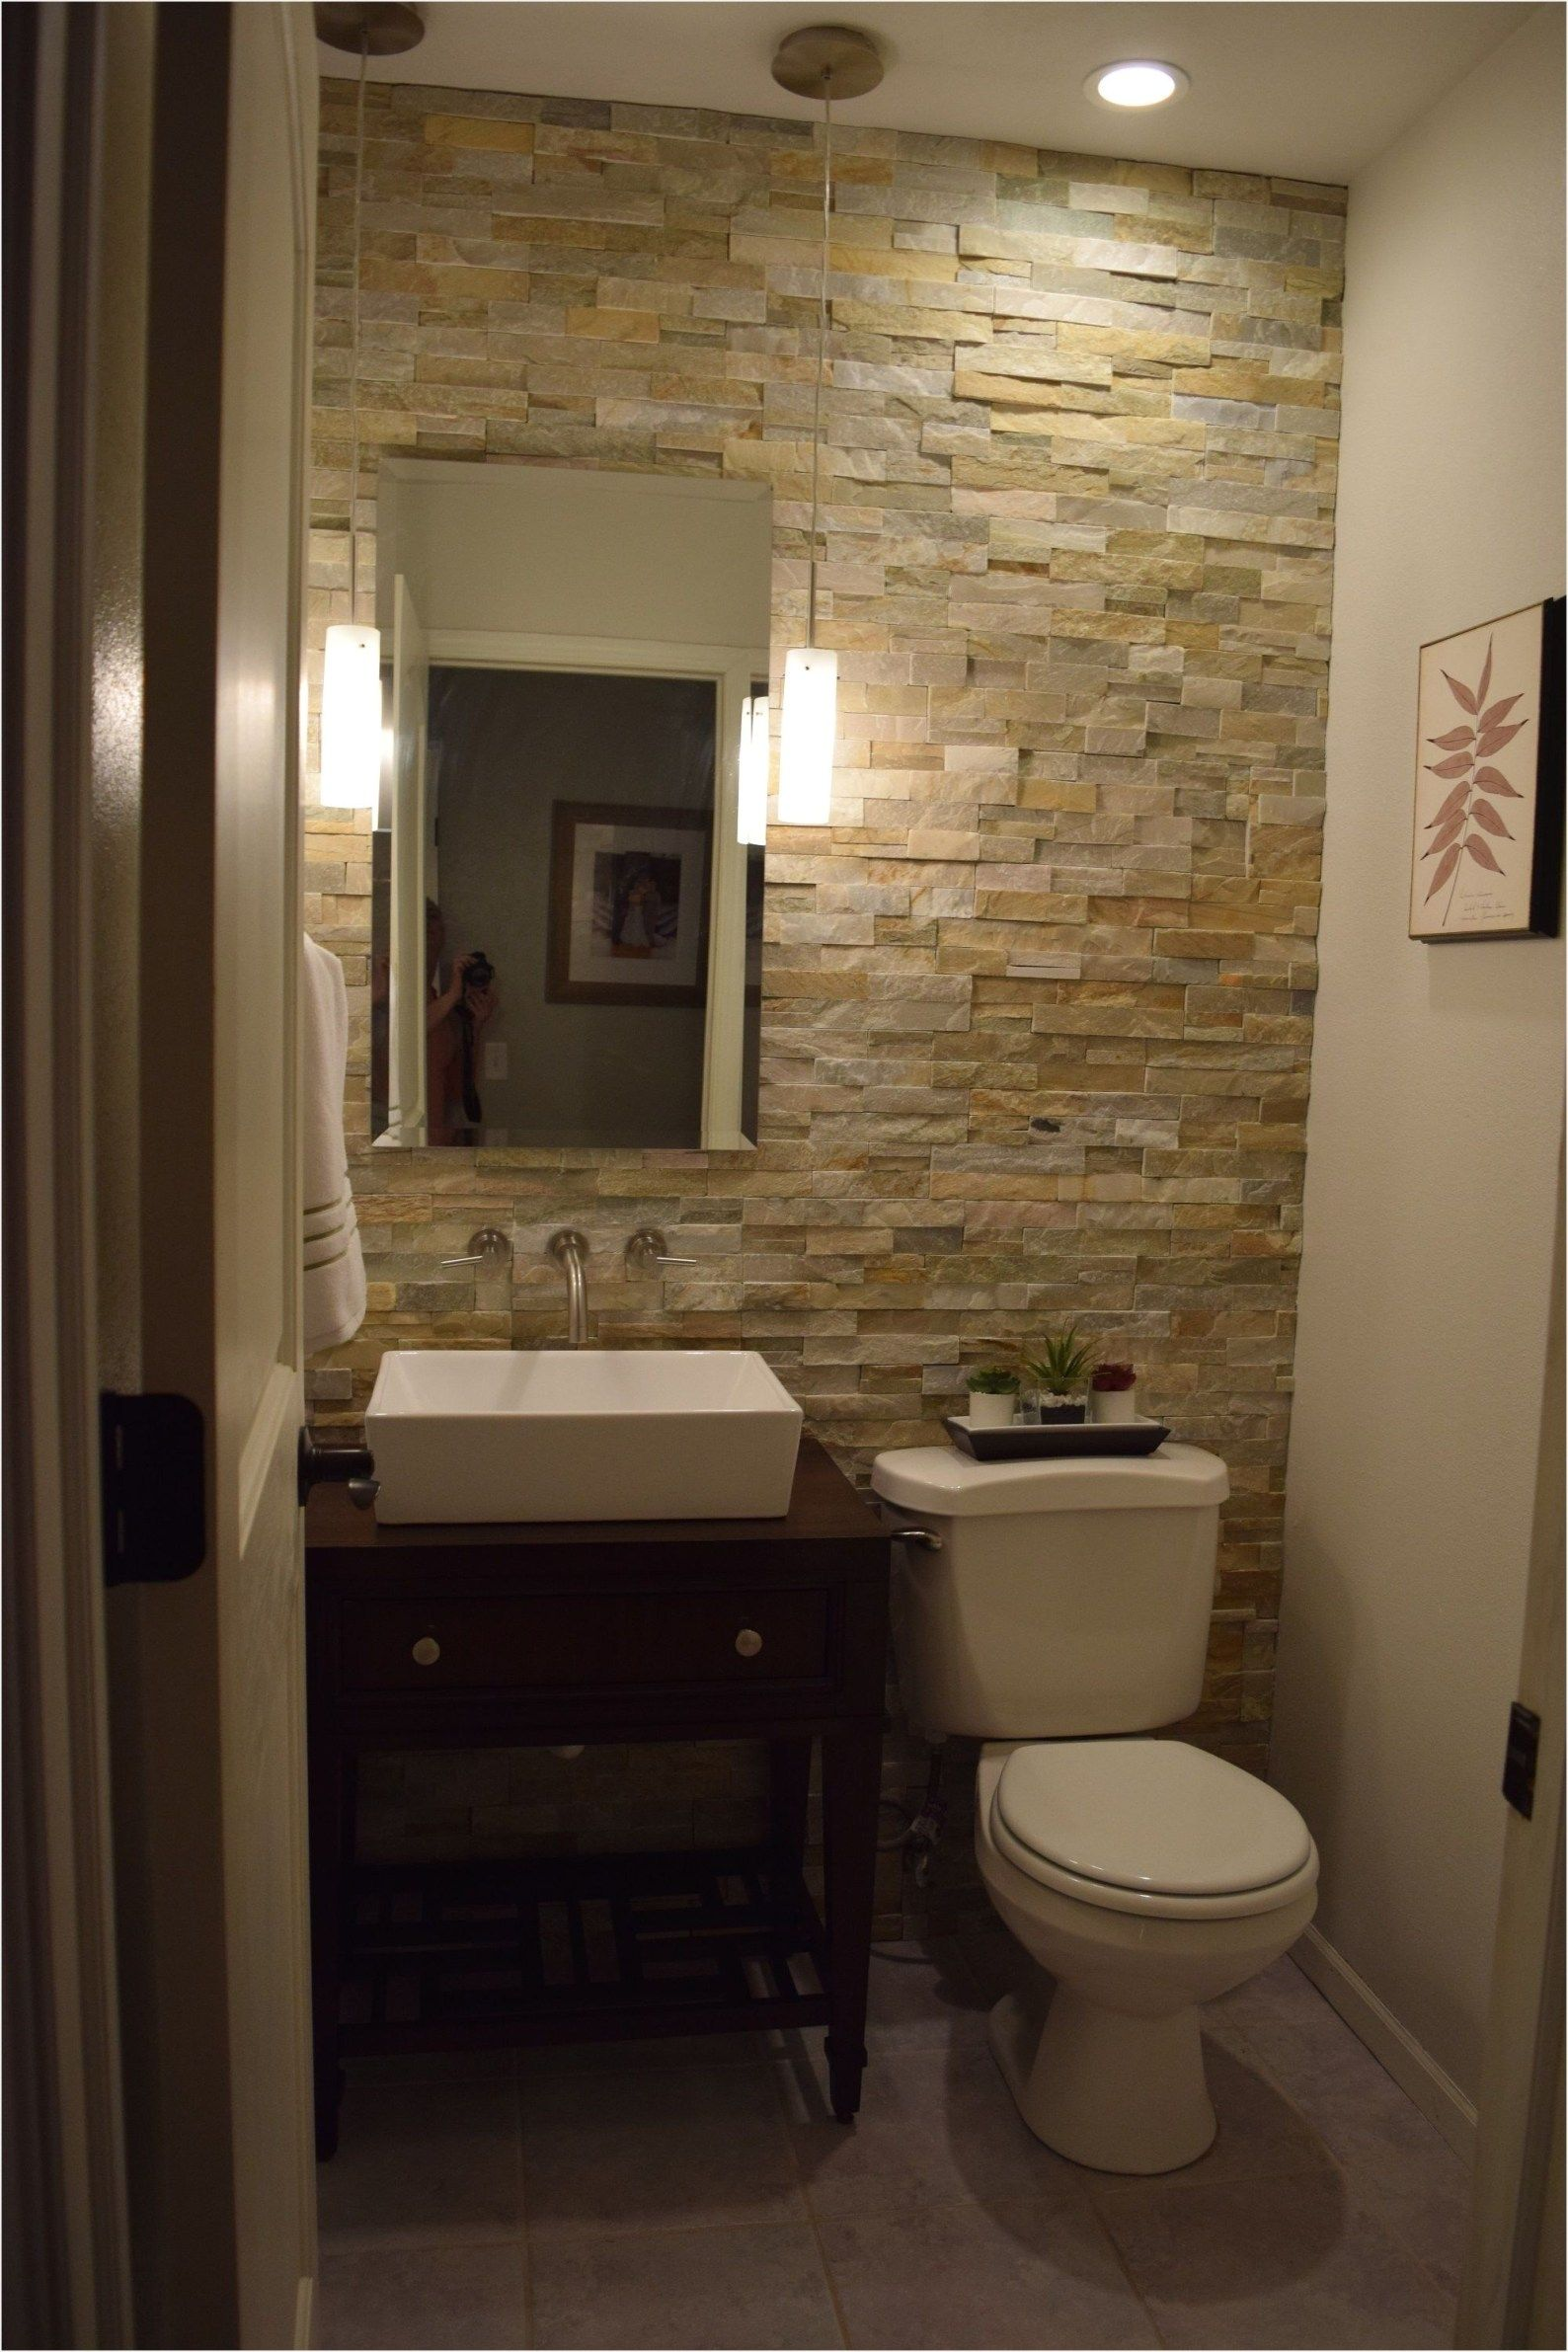 coastal half bath remodel ideas in 2020 small half on bathroom renovation ideas 2020 id=19408